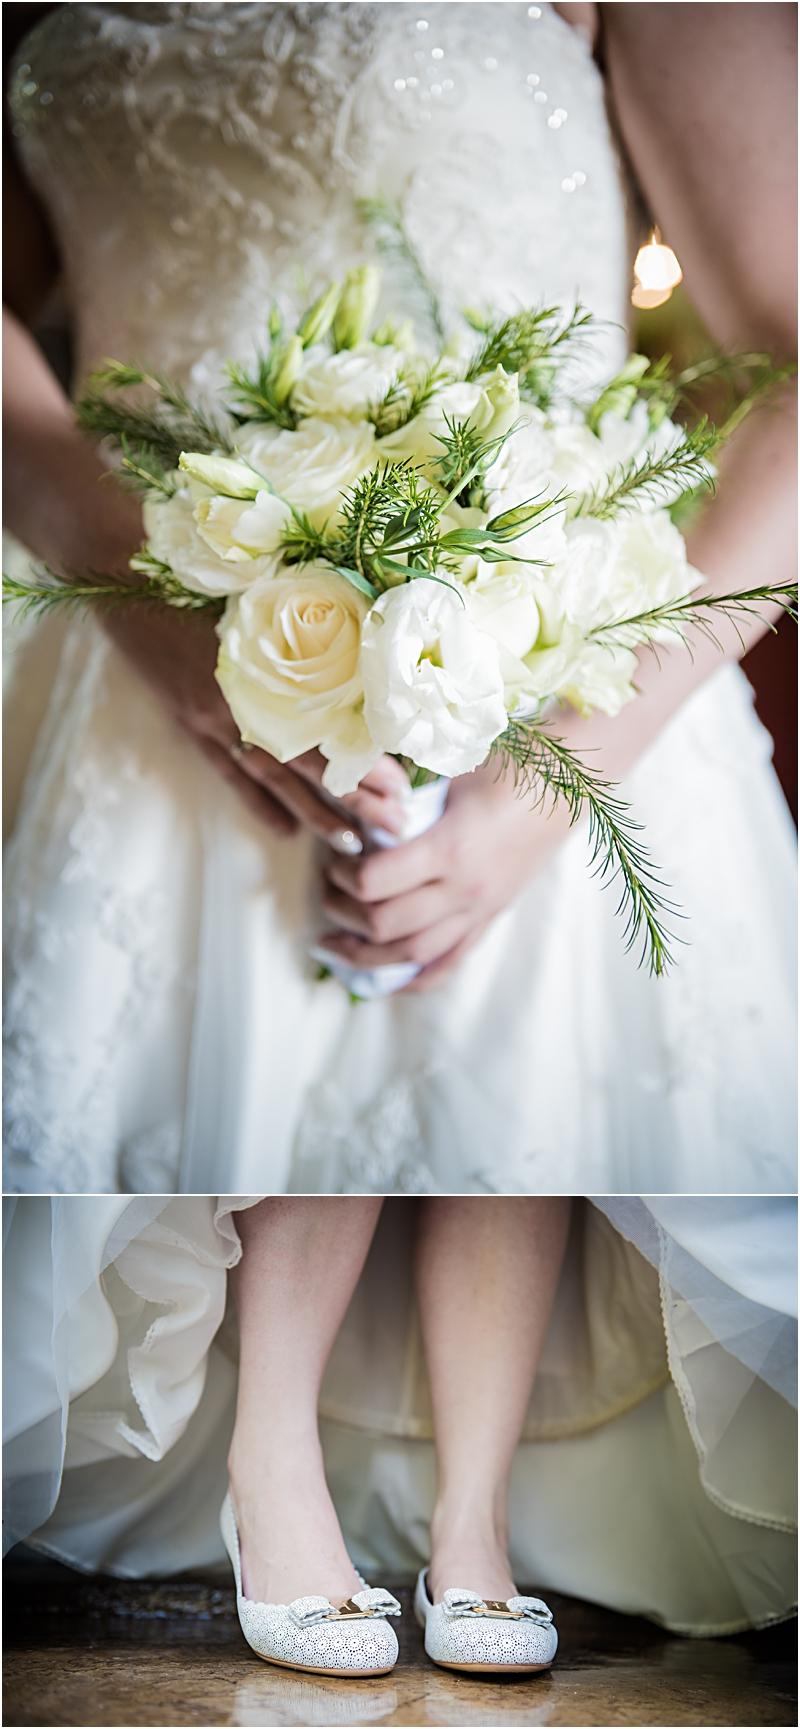 Best wedding photographer - AlexanderSmith_2096.jpg